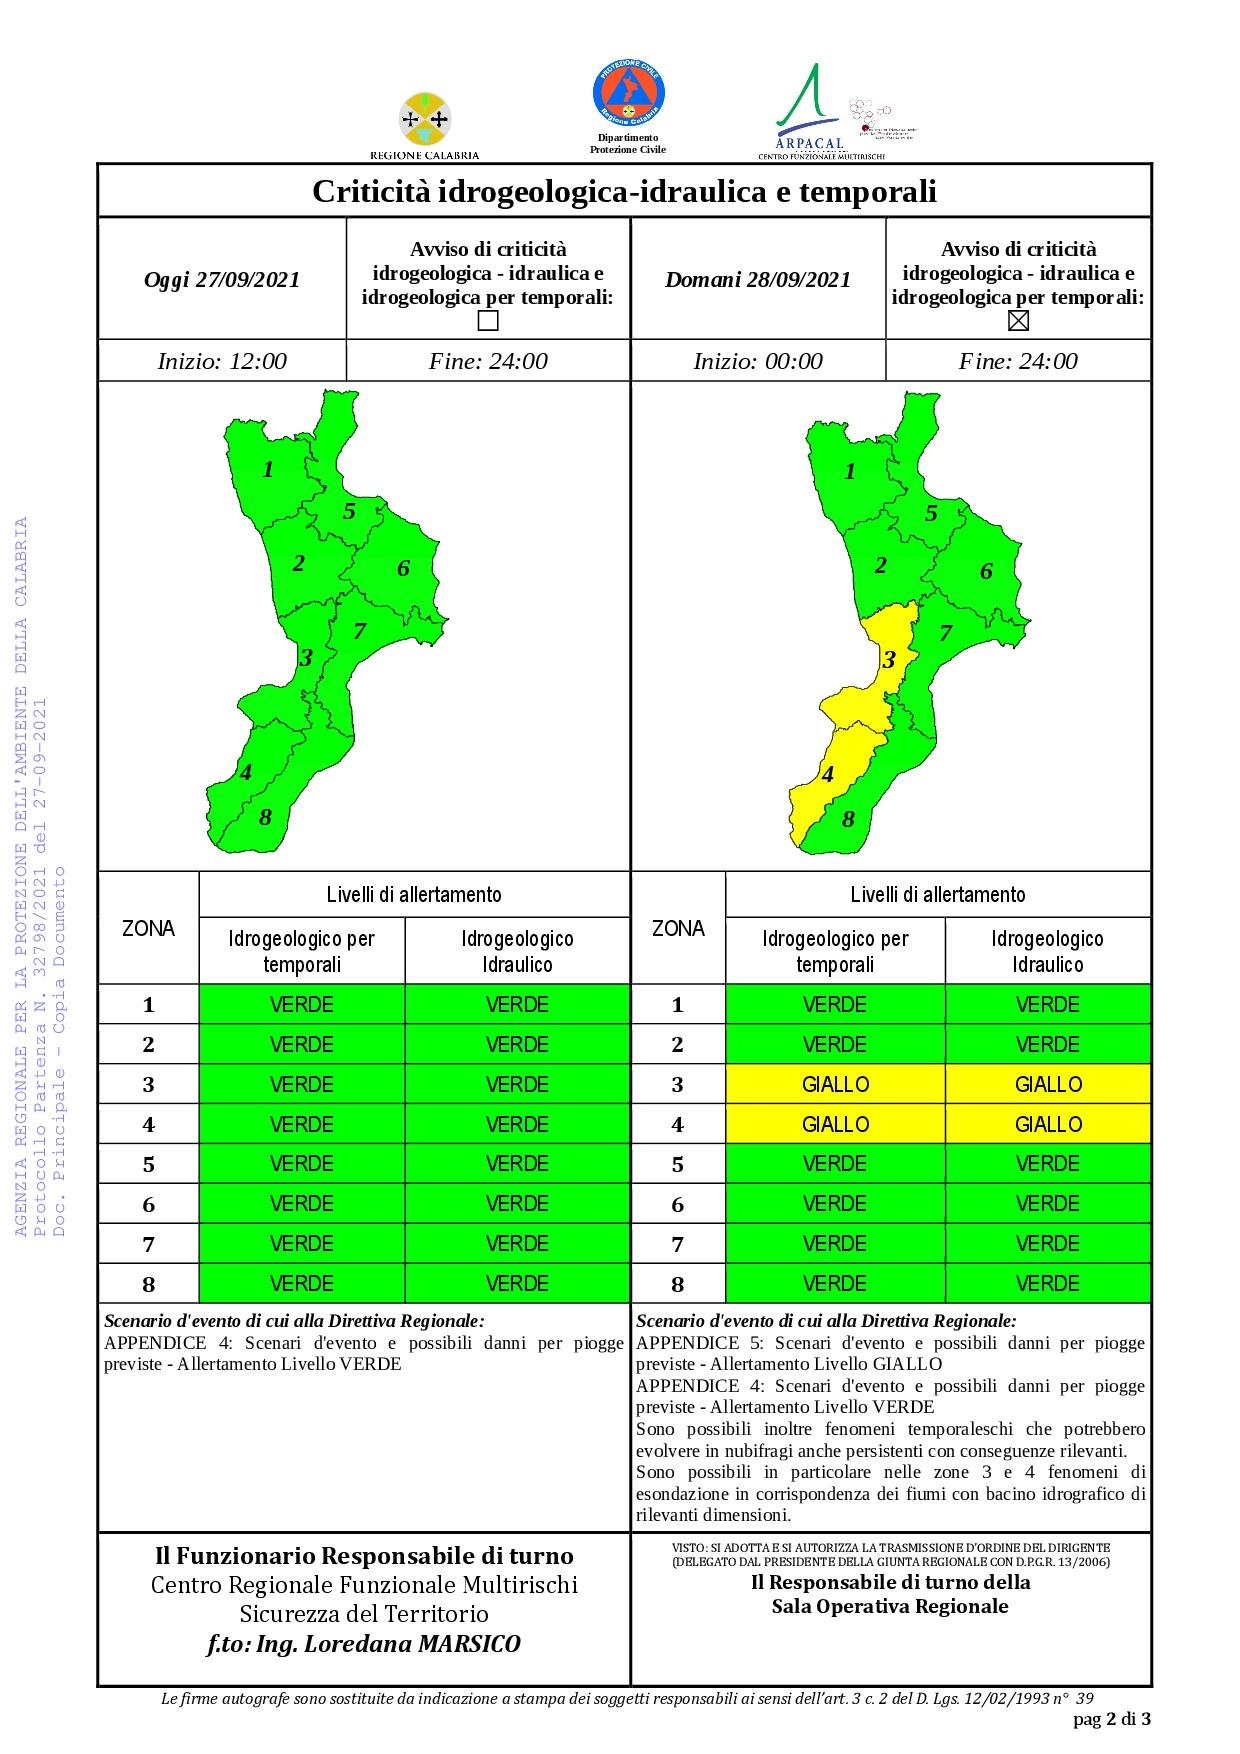 Criticità idrogeologica-idraulica e temporali in Calabria 27-09-2021